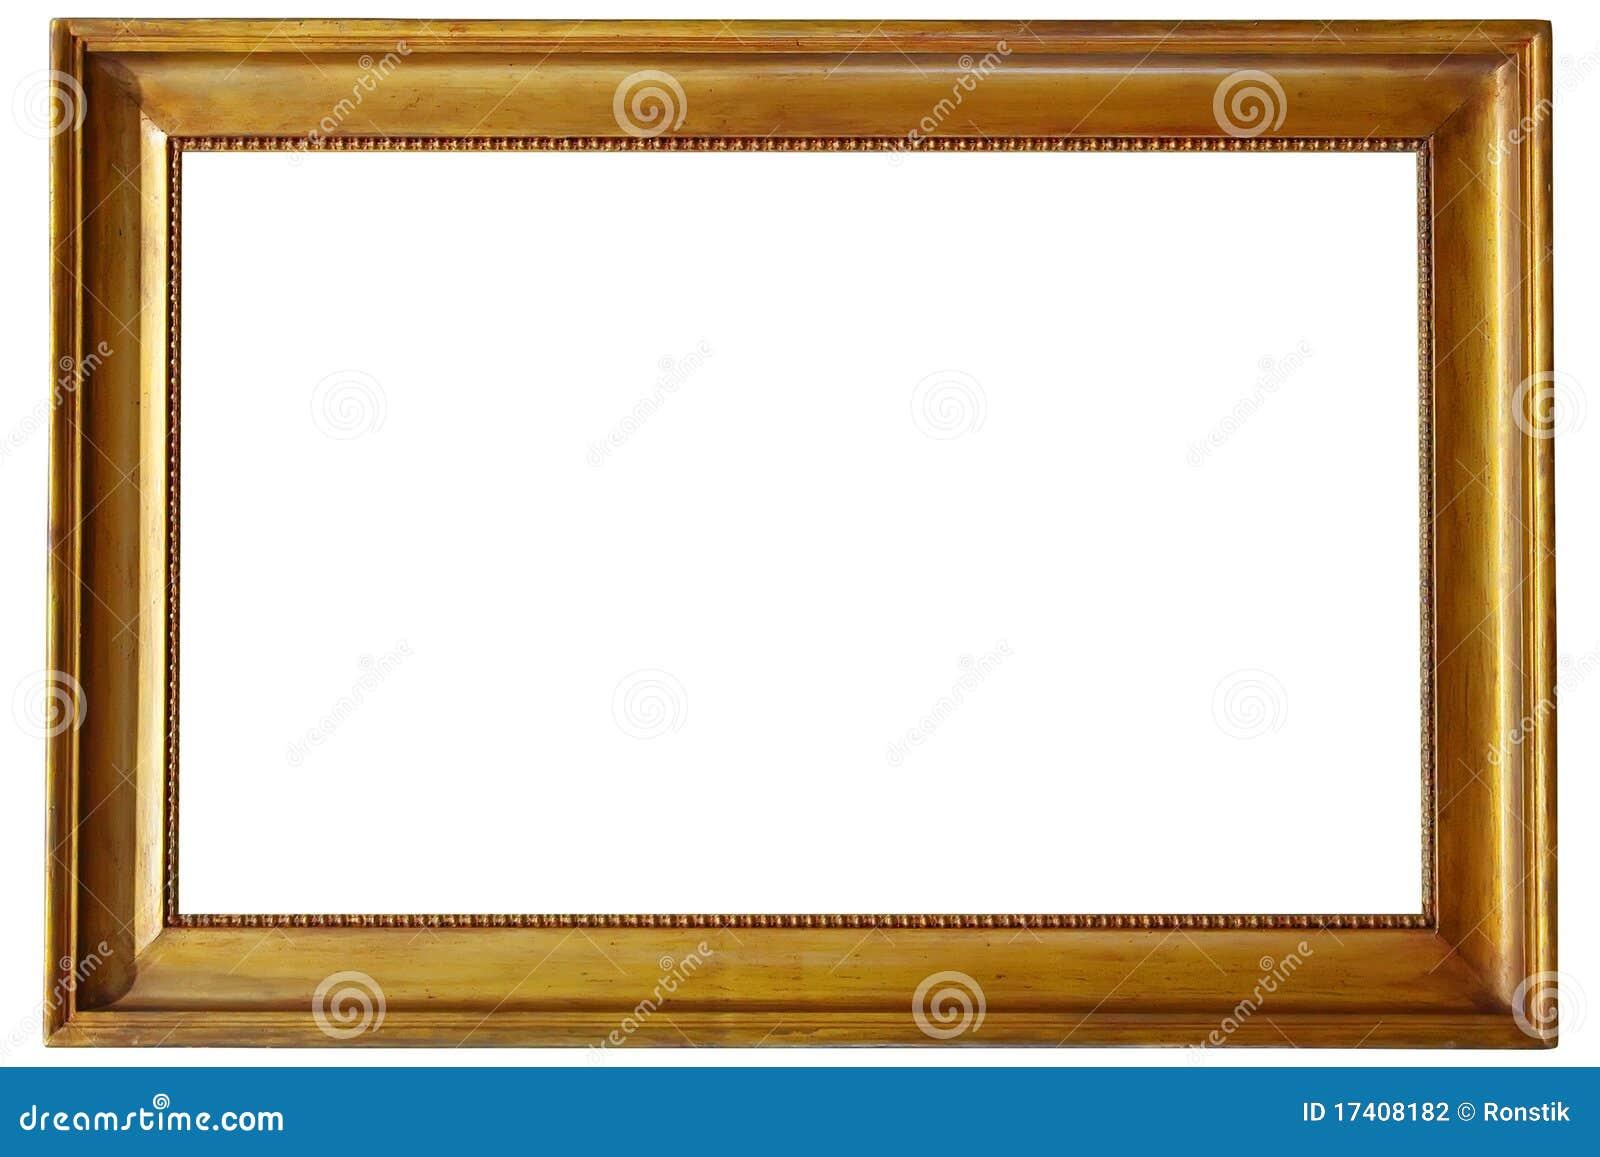 goldener bilderrahmen stockfoto bild von geschnitzt 17408182. Black Bedroom Furniture Sets. Home Design Ideas